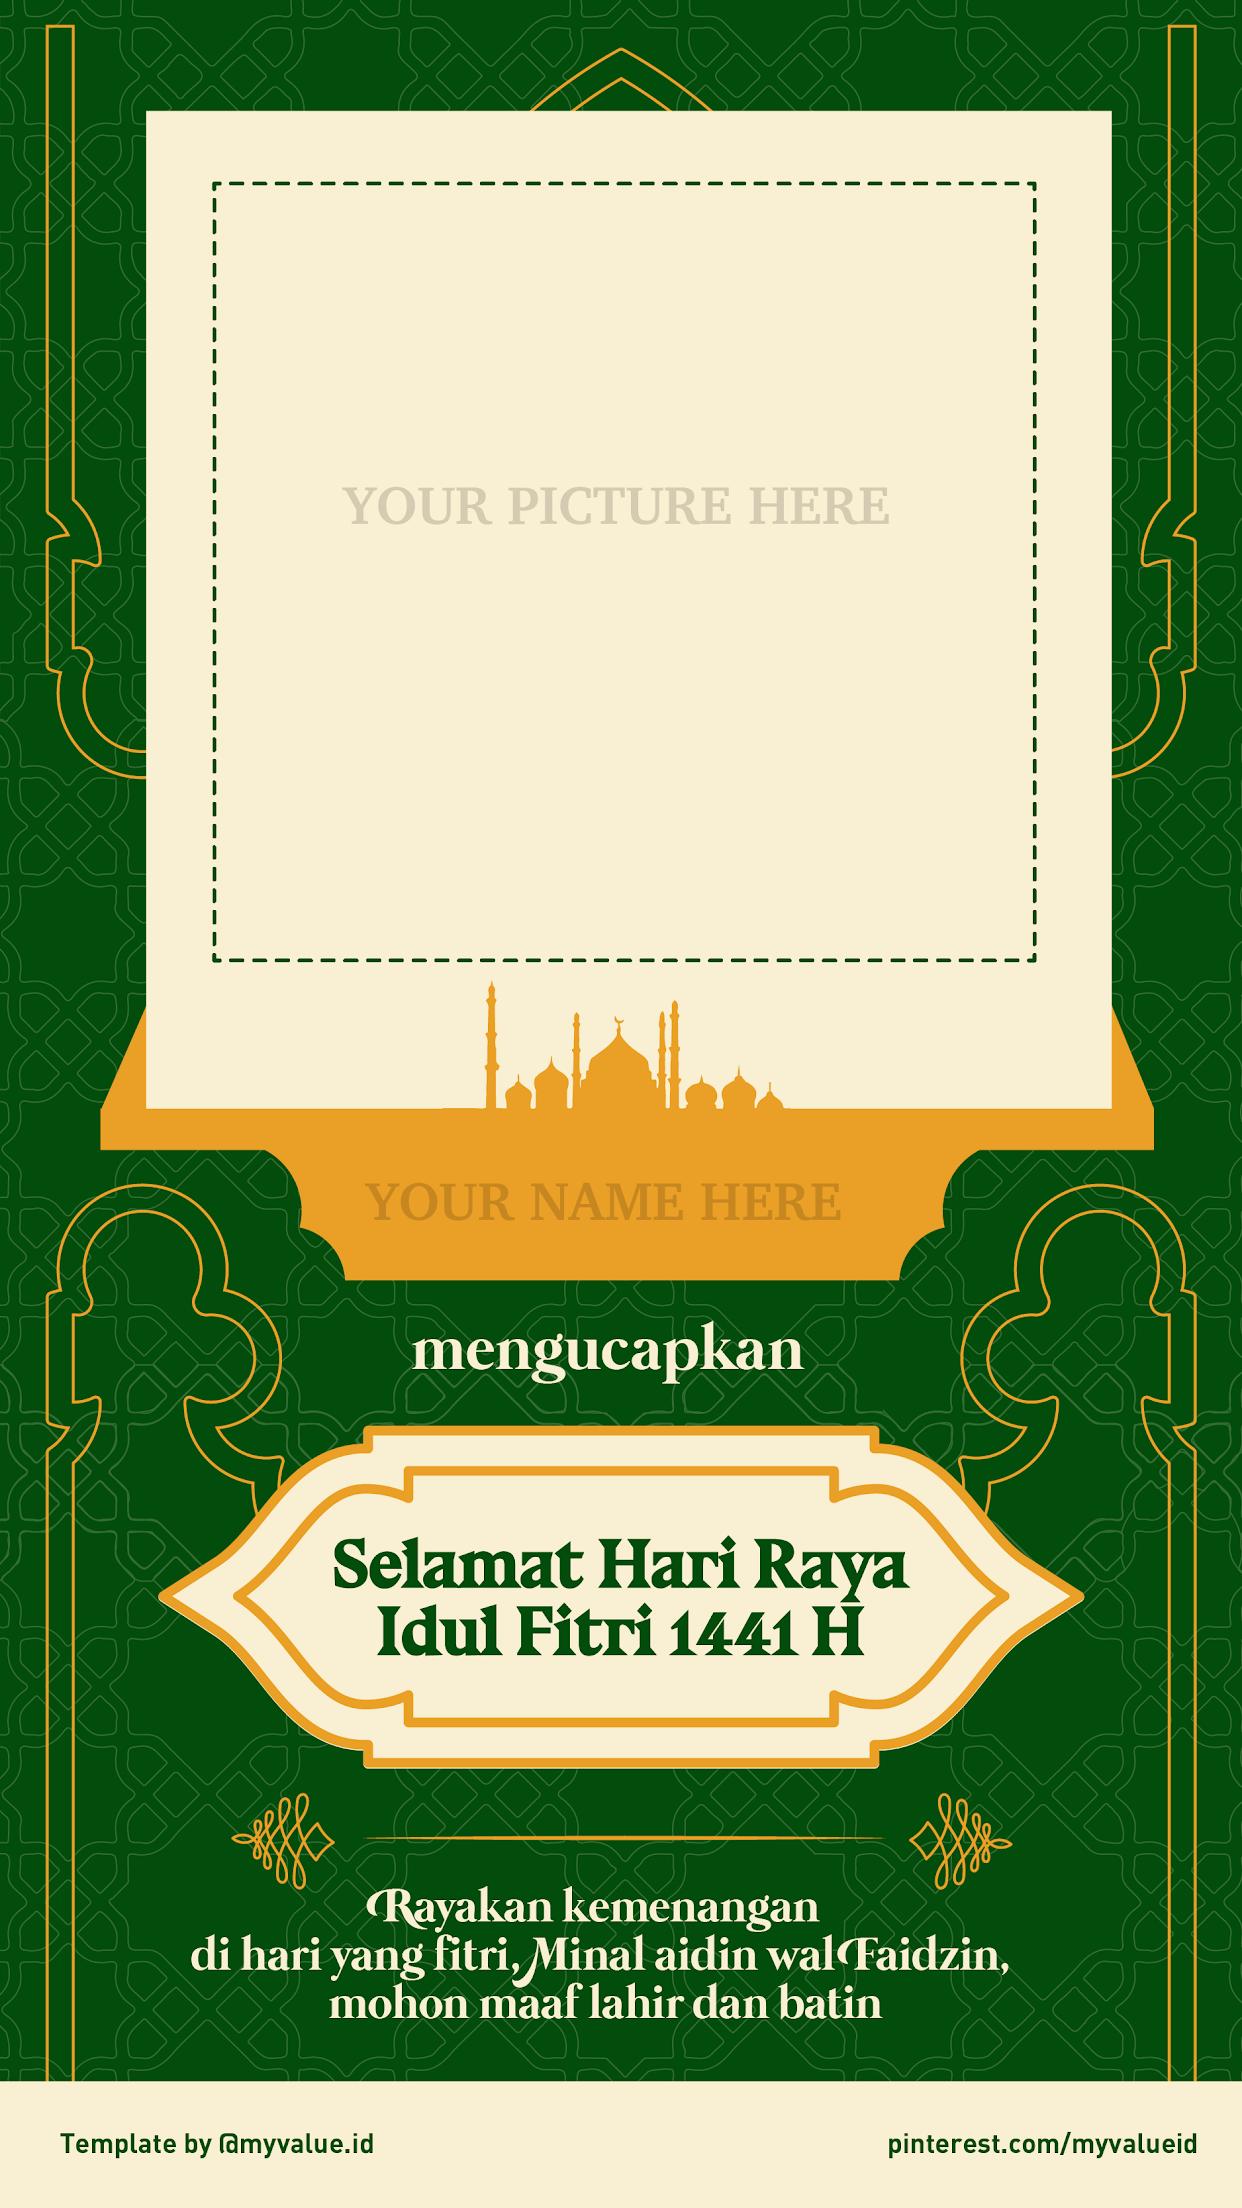 Ucapan Idul Fitri Png : ucapan, fitri, TEMPLATE], Ucapan, Selamat, Fitri, Templates,, Instagram, Photo,, Photo, Video